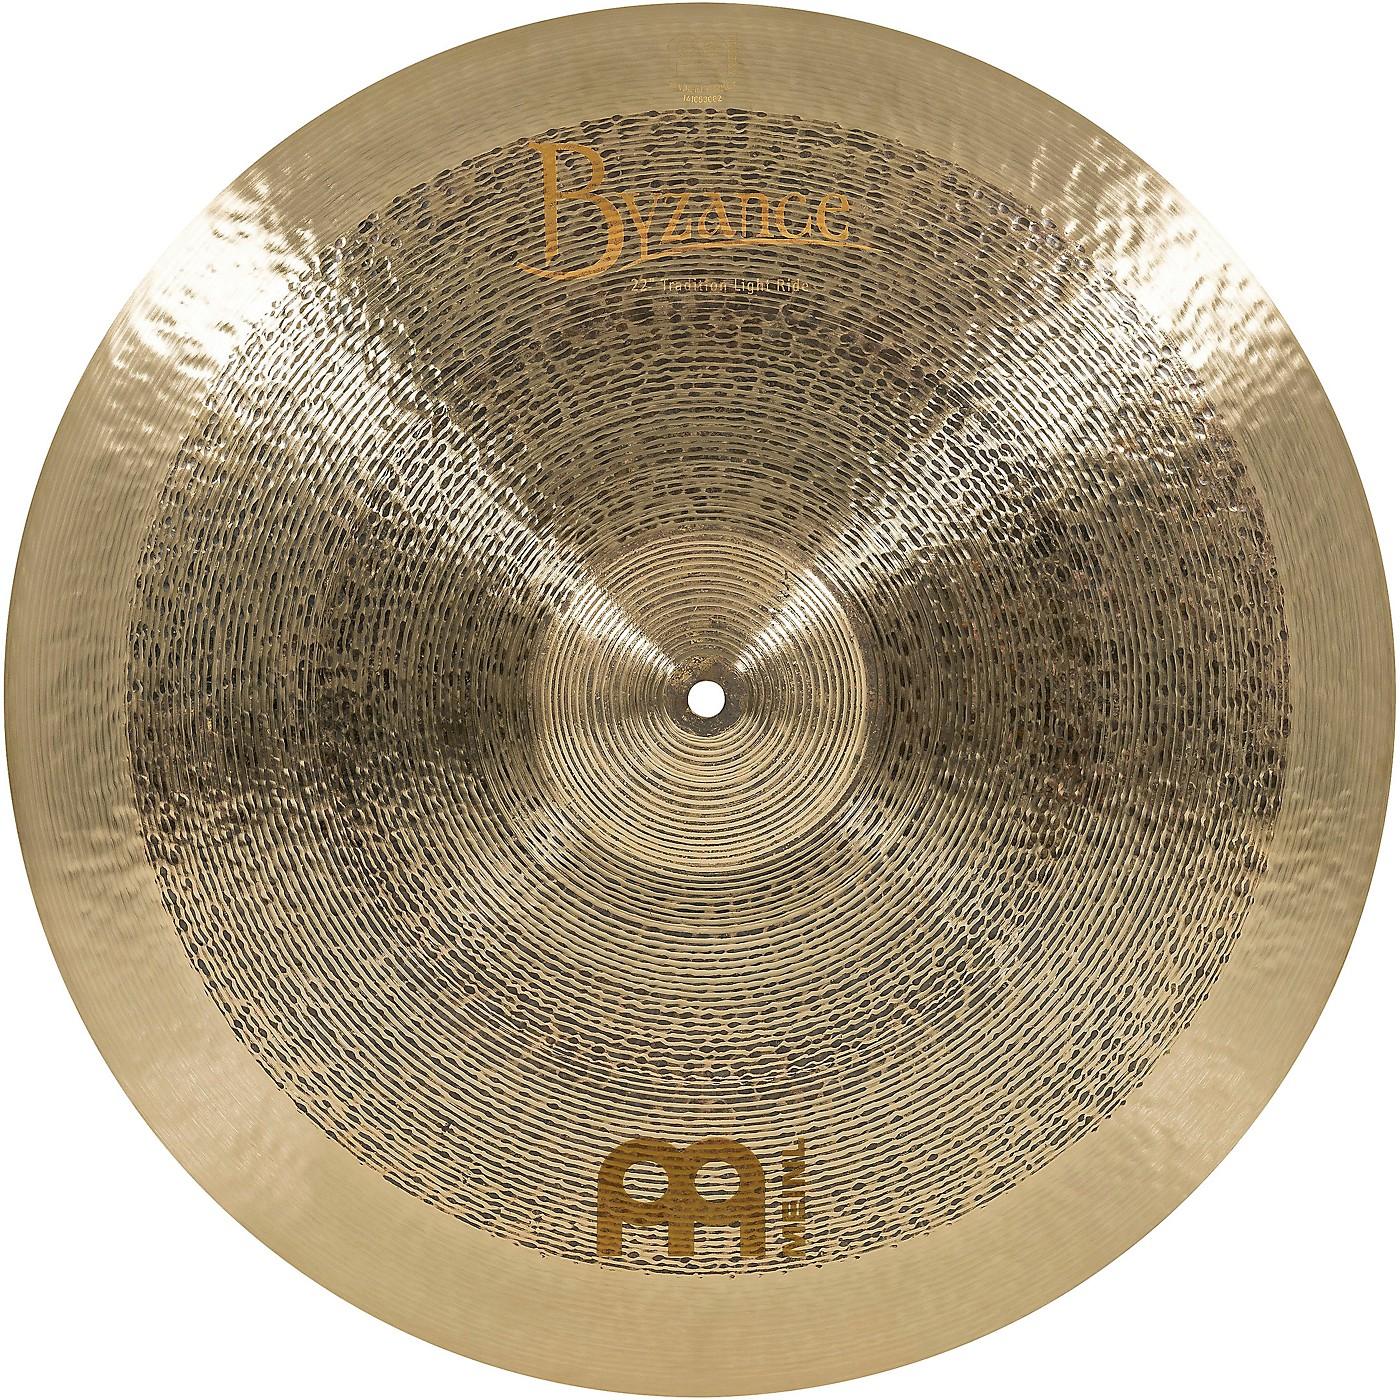 Meinl Byzance Tradition Light Ride Cymbal thumbnail